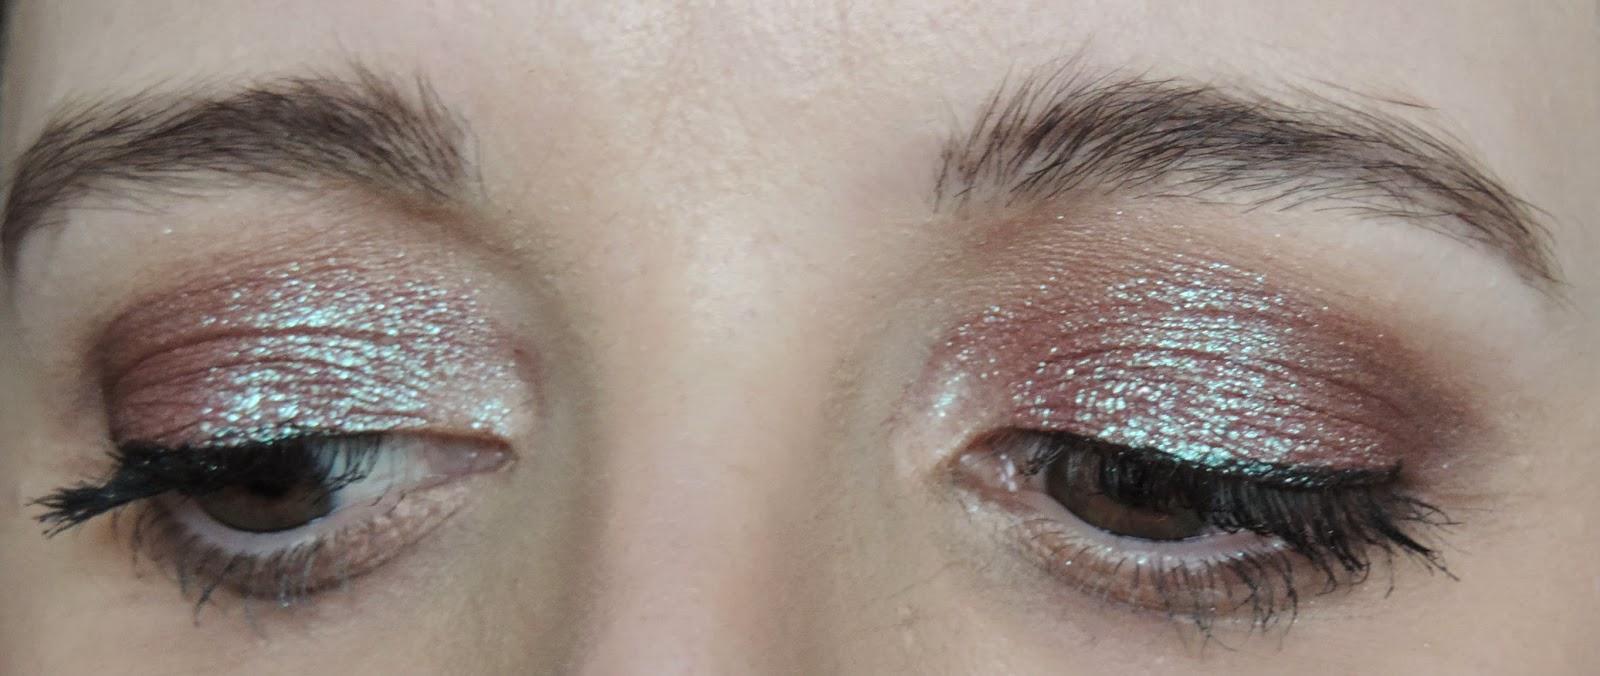 (Applied): Urban Decay Moondust Eyeshadow in Solstice